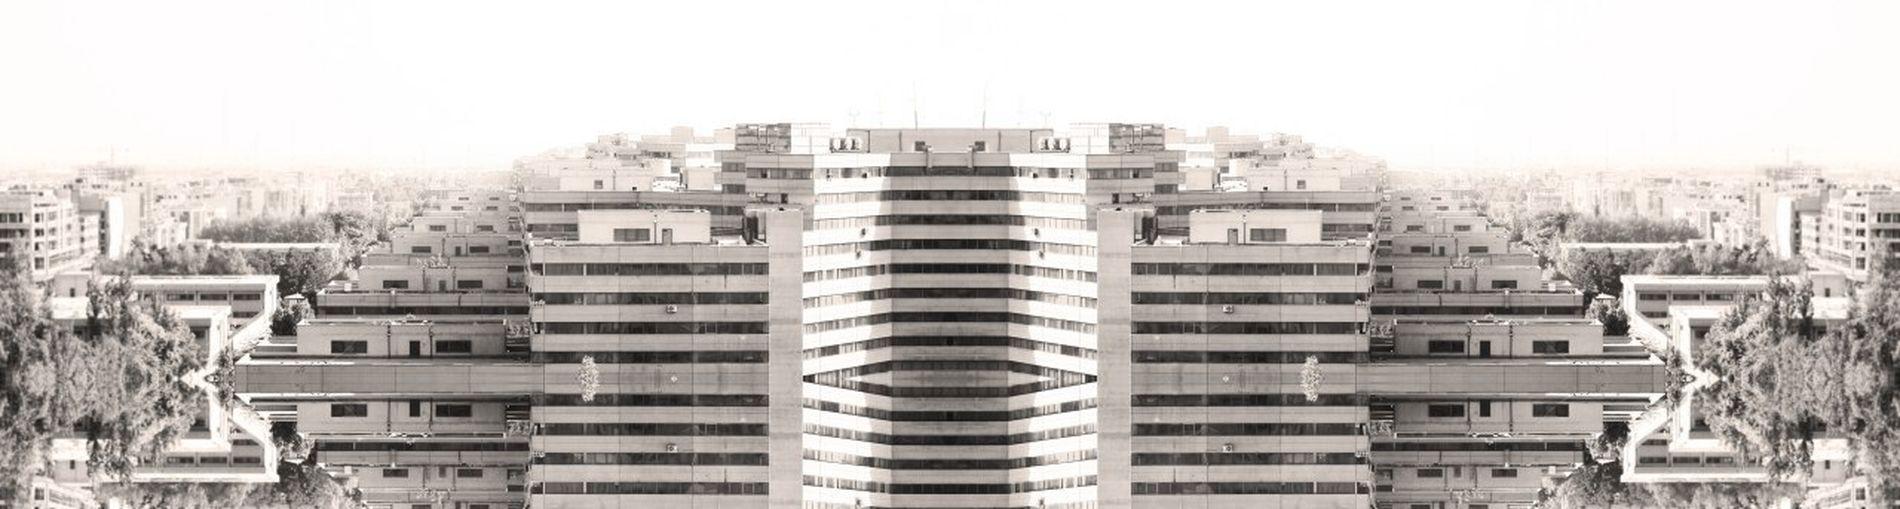 Fake Panorama Building Exterior Cityscape